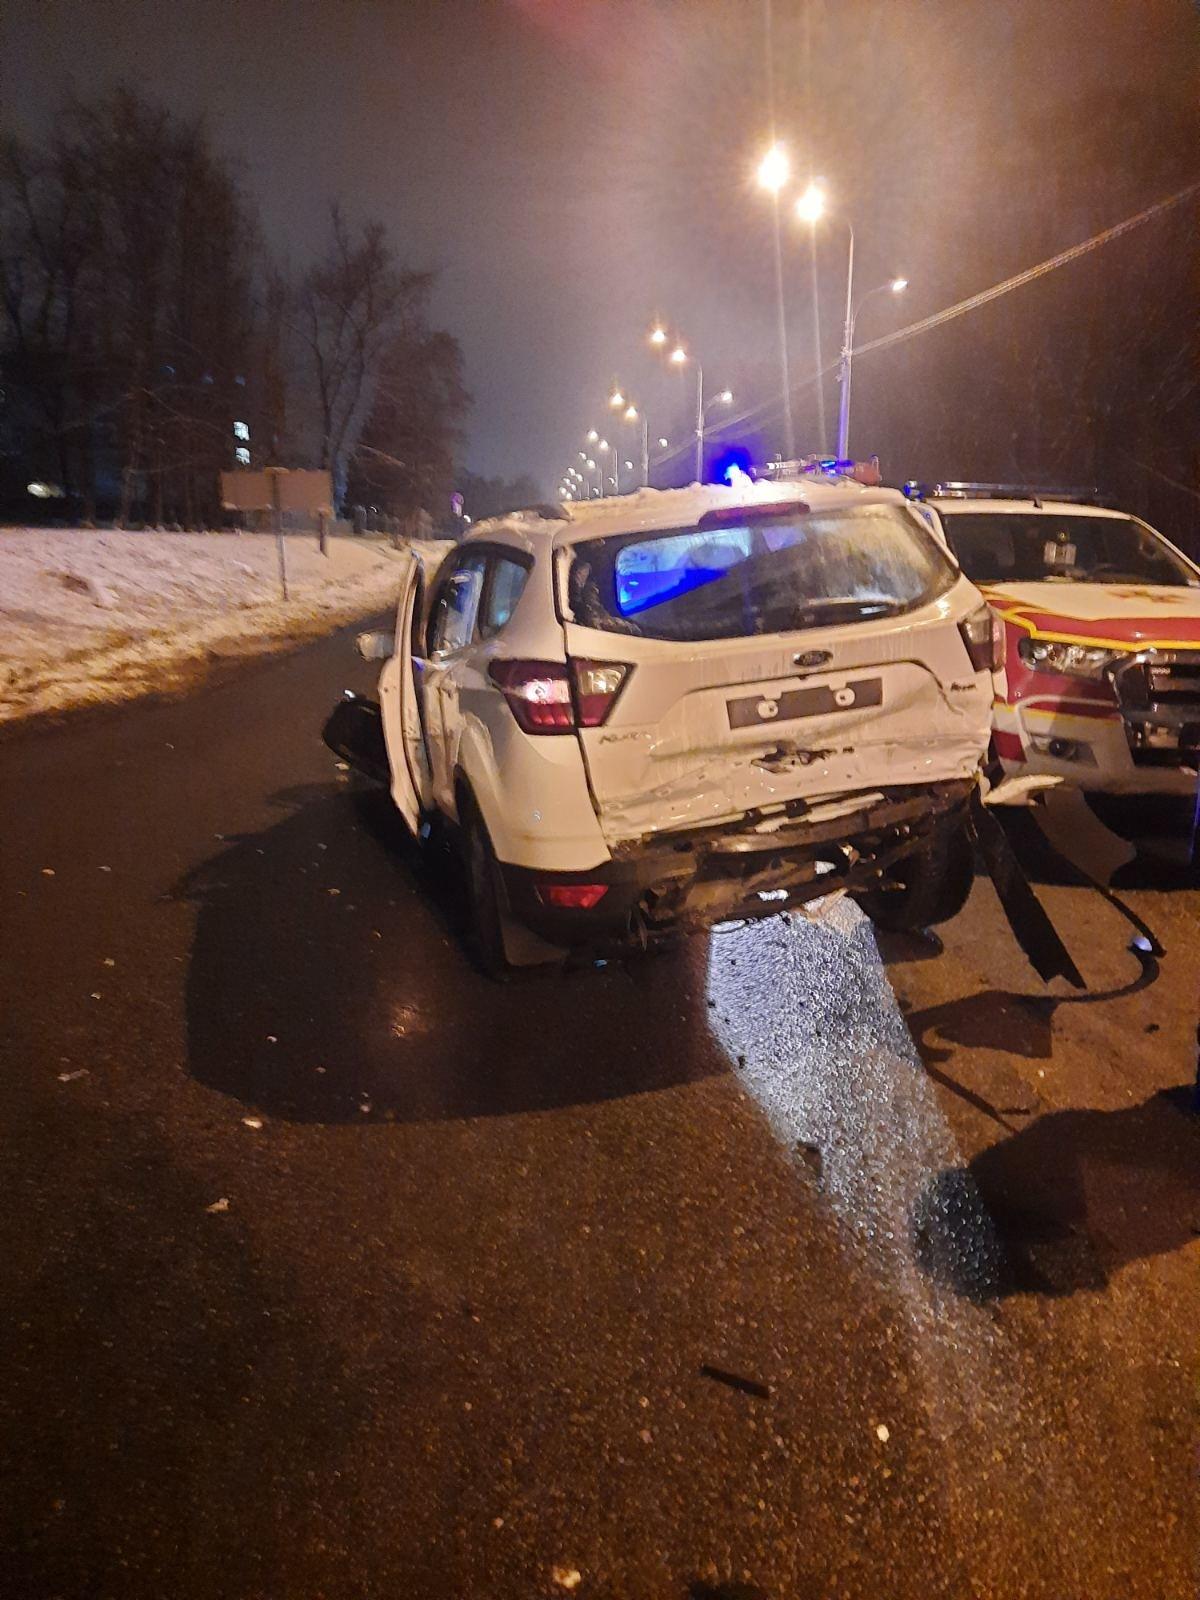 На трассе в Харькове спасатели вытащили авто, слетевшее в кювет, - ФОТО, фото-3